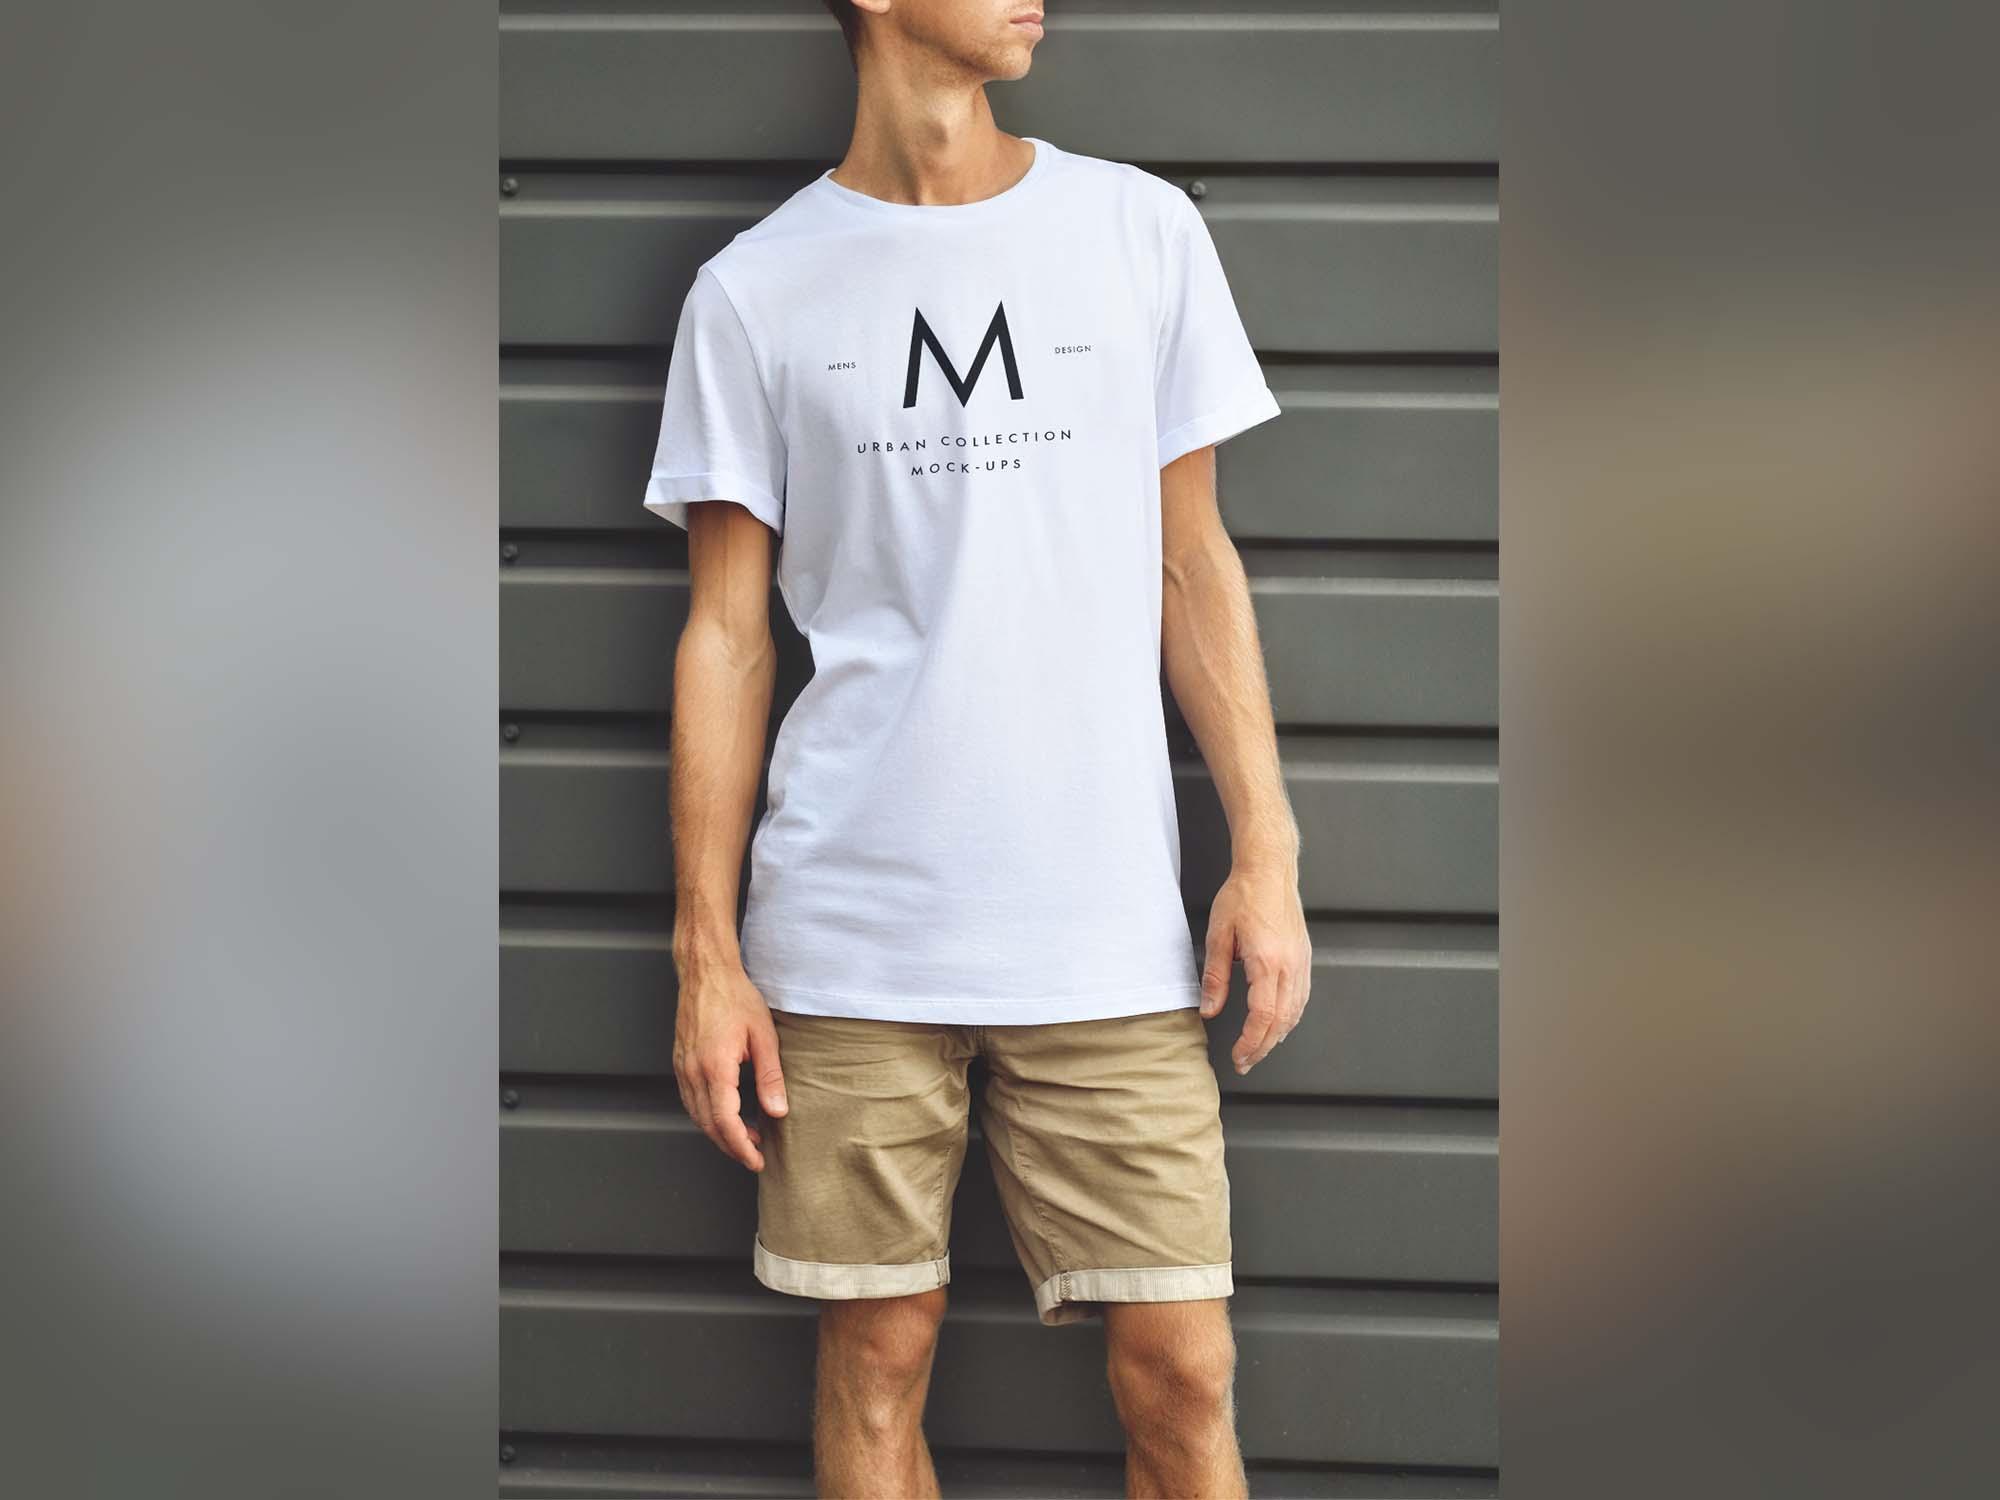 Urban T-Shirt Mockup